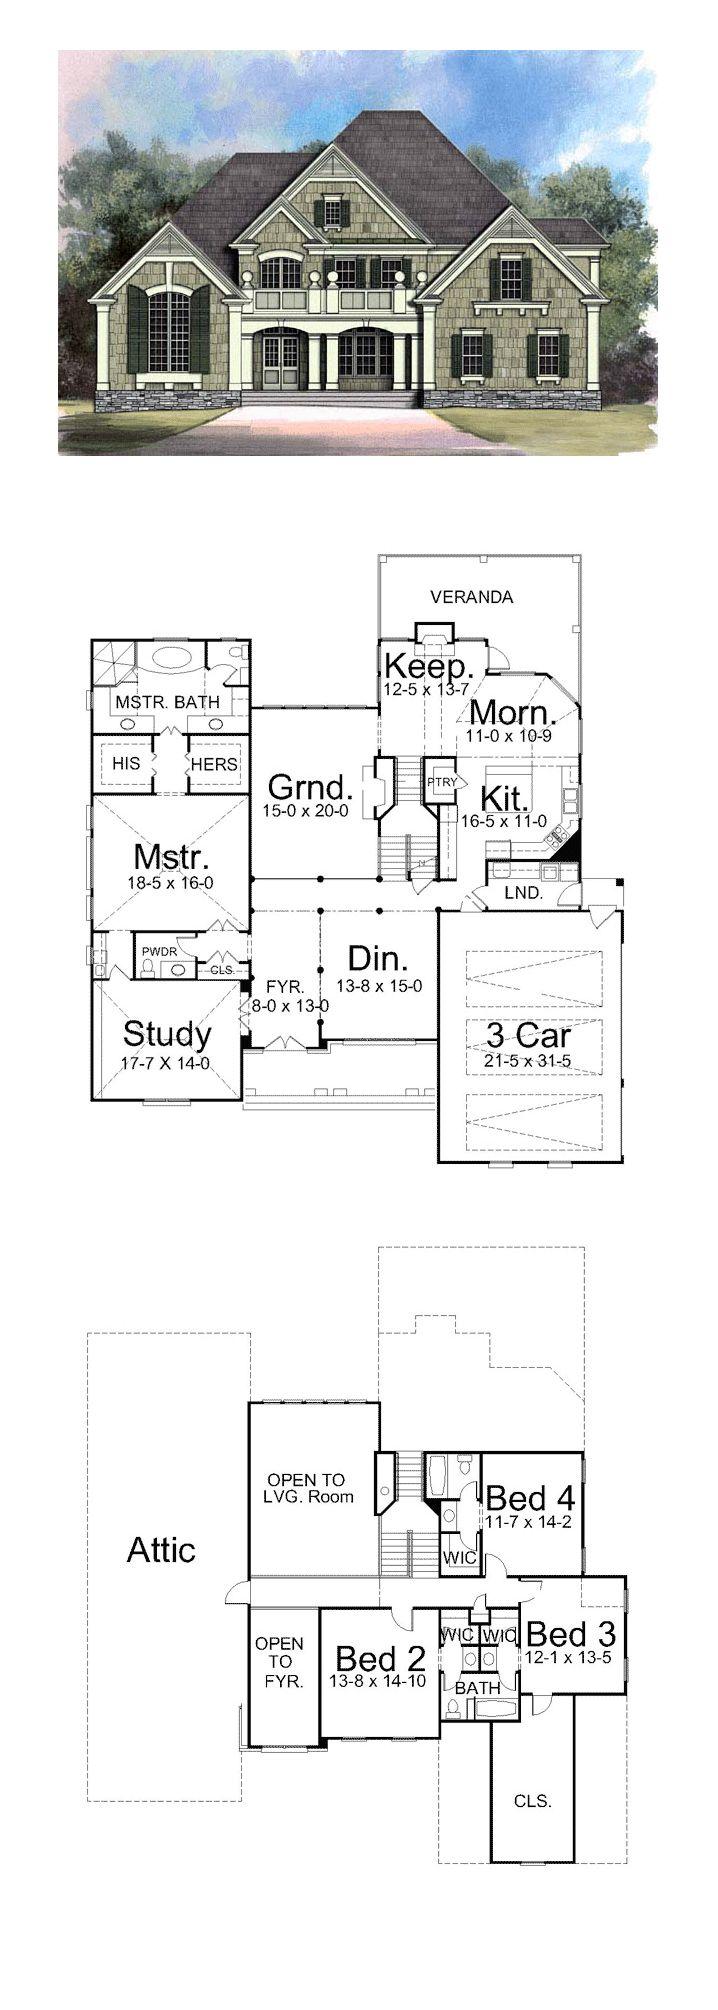 Greek Revival House Plan 72017   Total Living Area: 3363 SQ FT, 4 bedrooms and 4 bathrooms. #greekrevivalhome